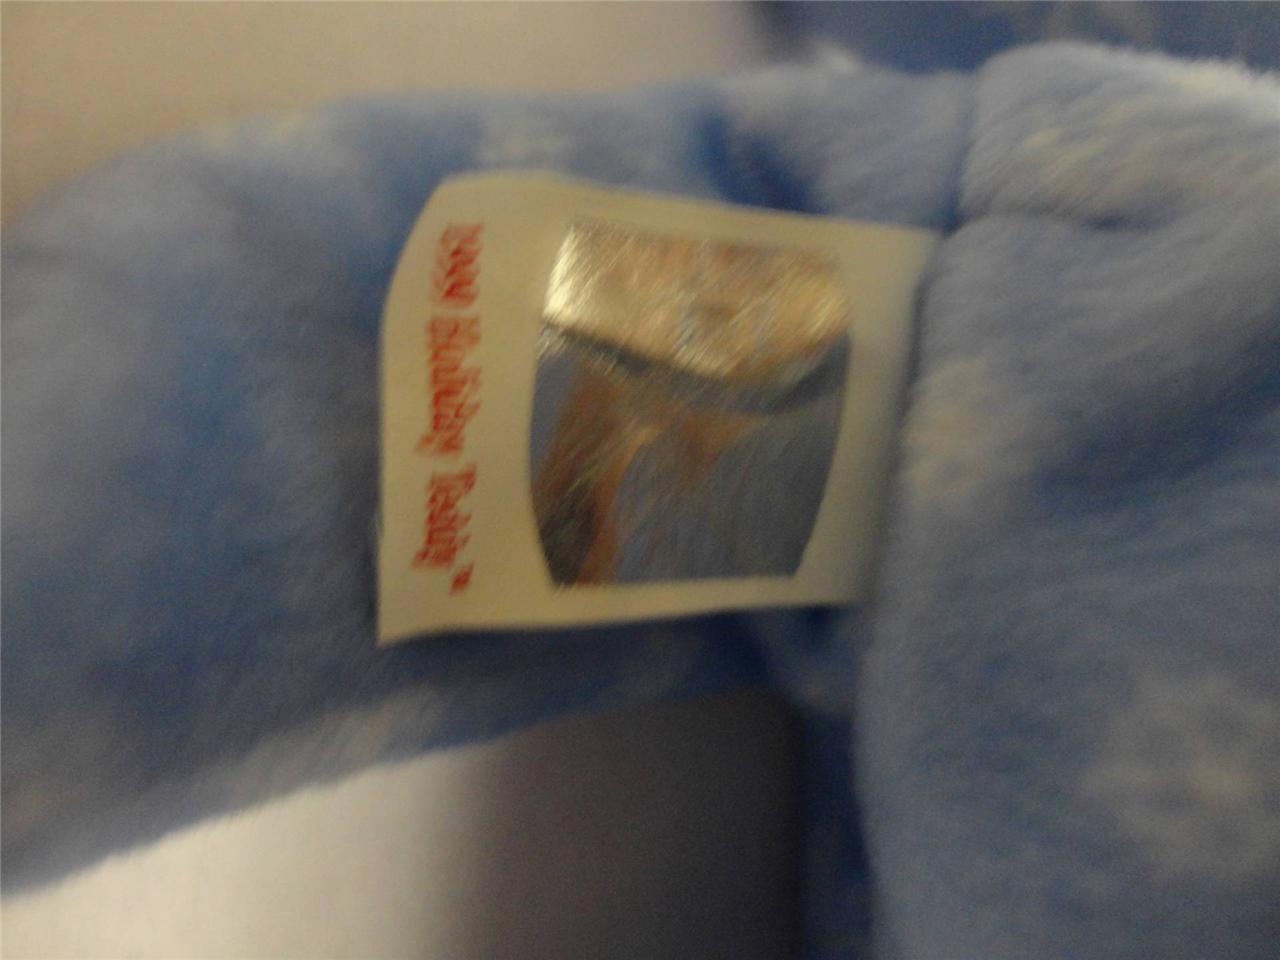 TY Beanie Baby Bears Huggy 2000 Clubby II 1999 and Holiday Teddy 1999 Lot of 3